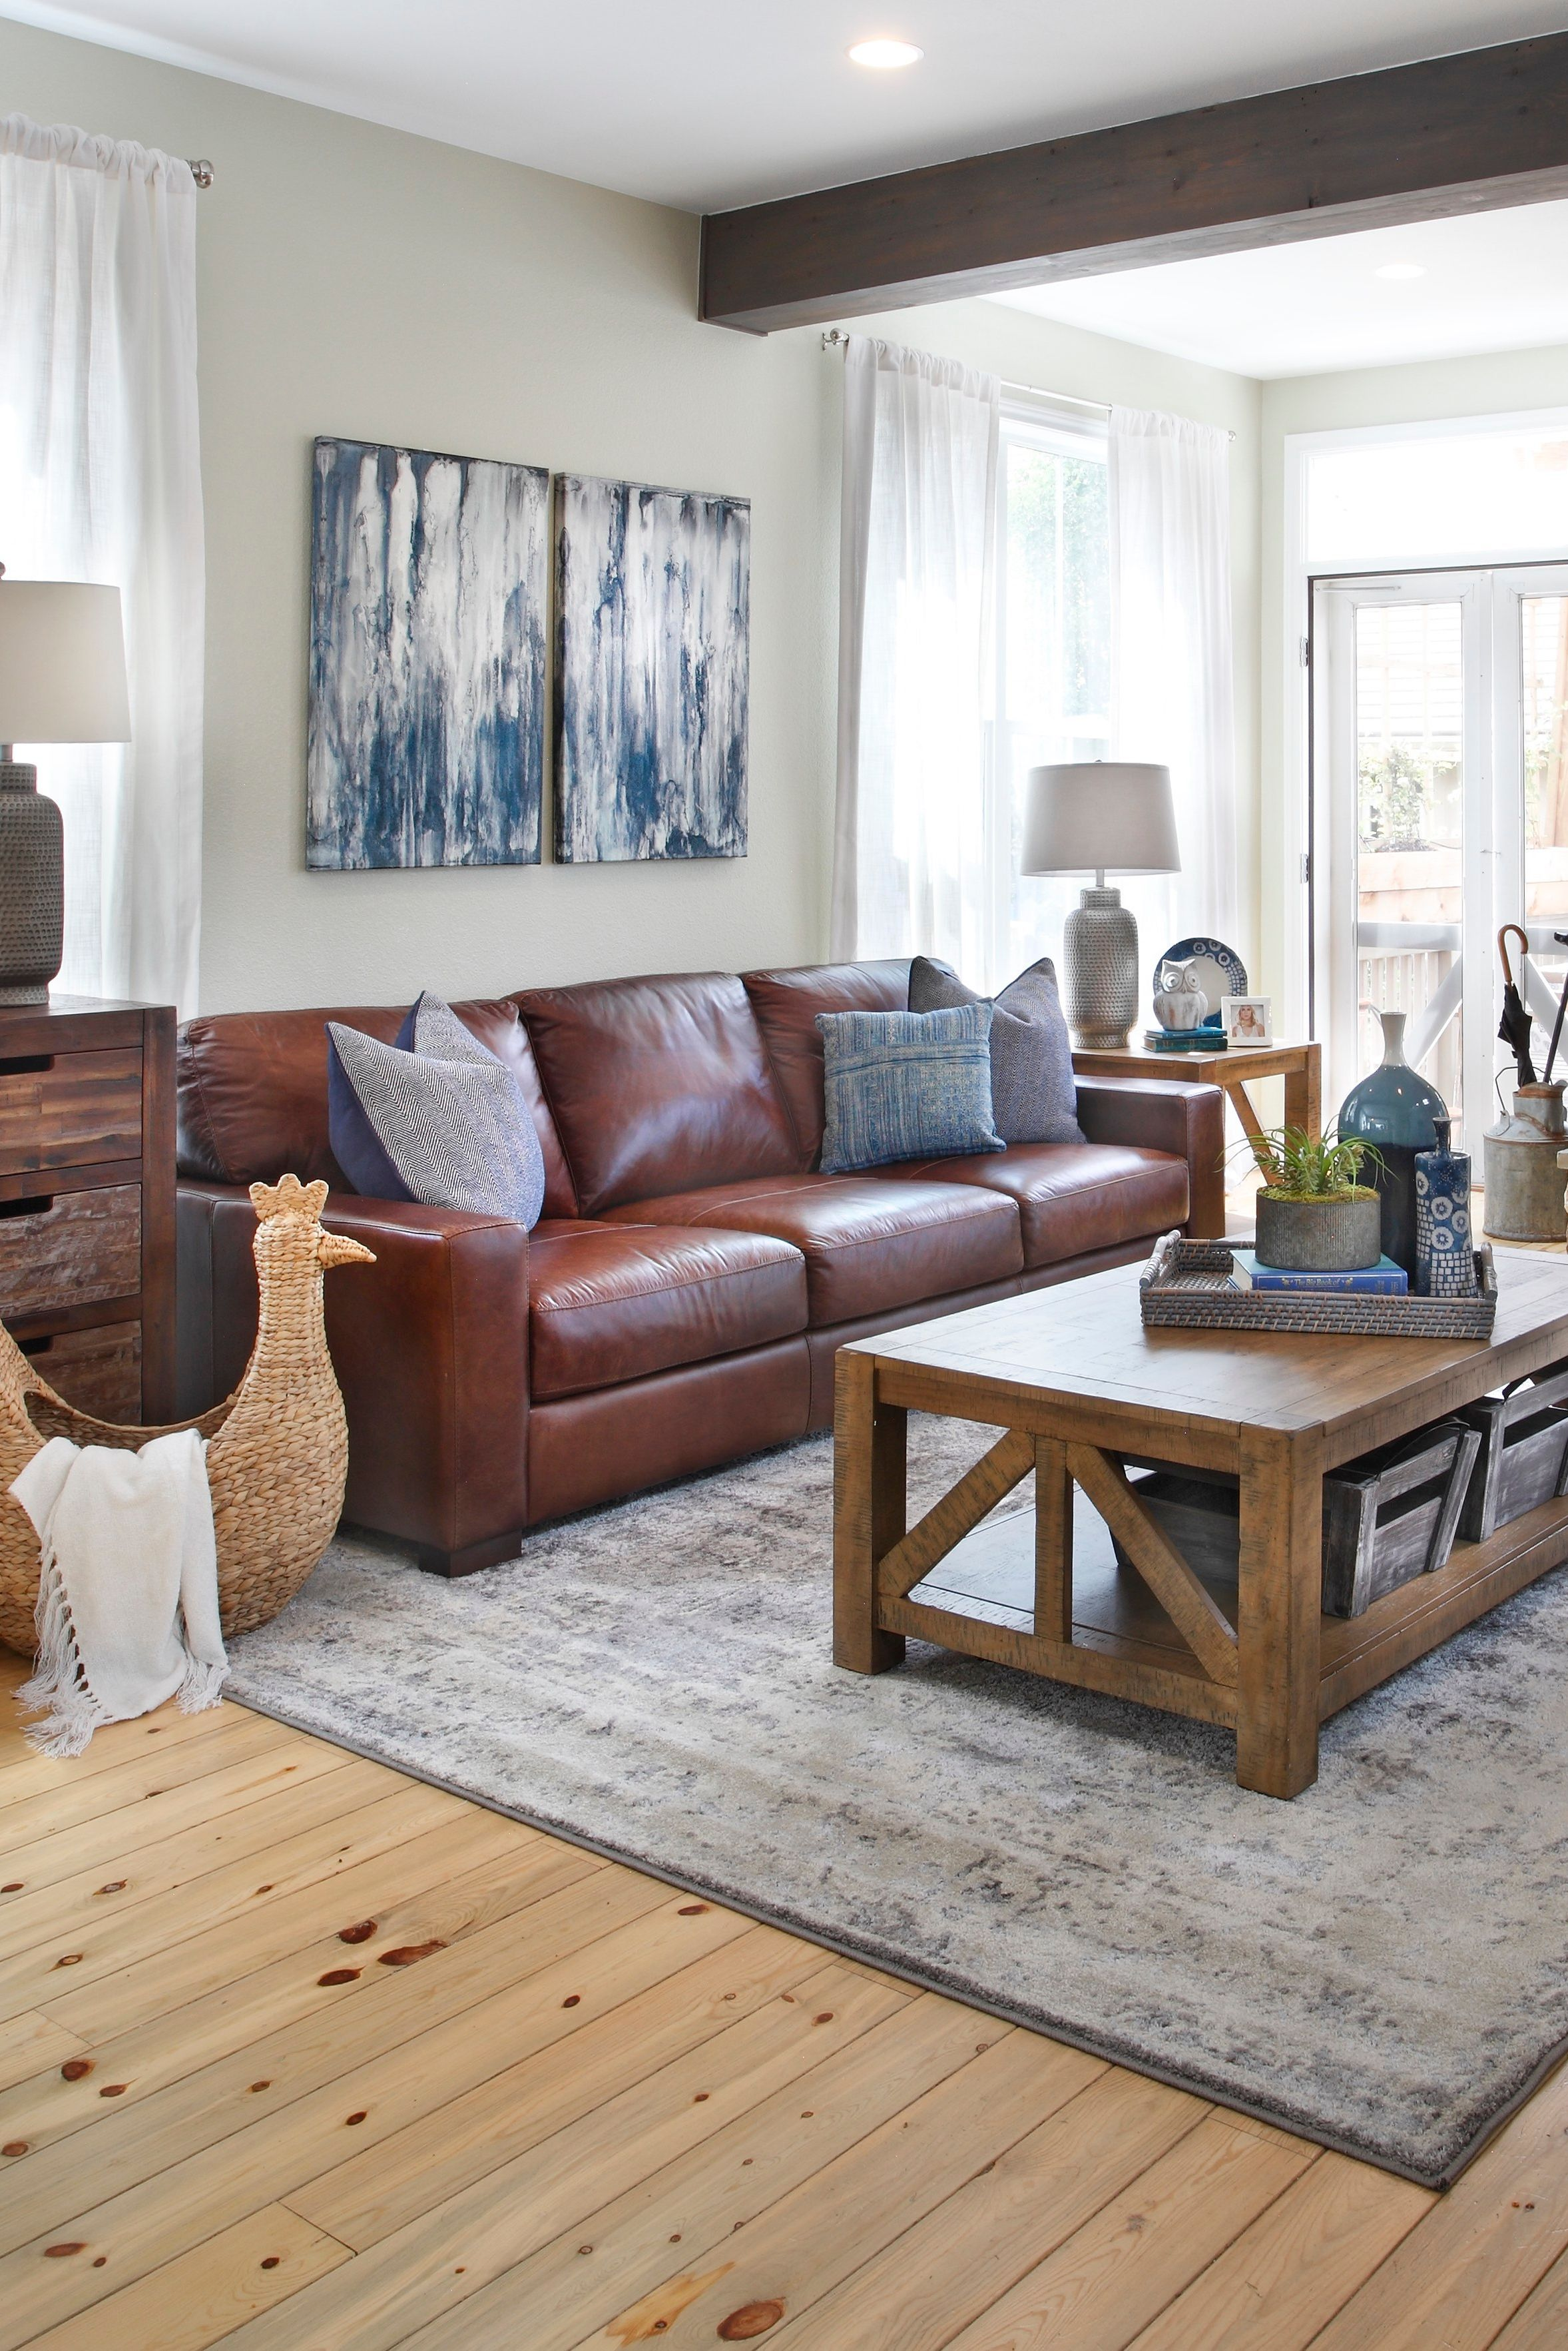 Durango Leather Sofa Furniture Row In 2020 Leather Sofa Furniture Rowe Furniture House Interior